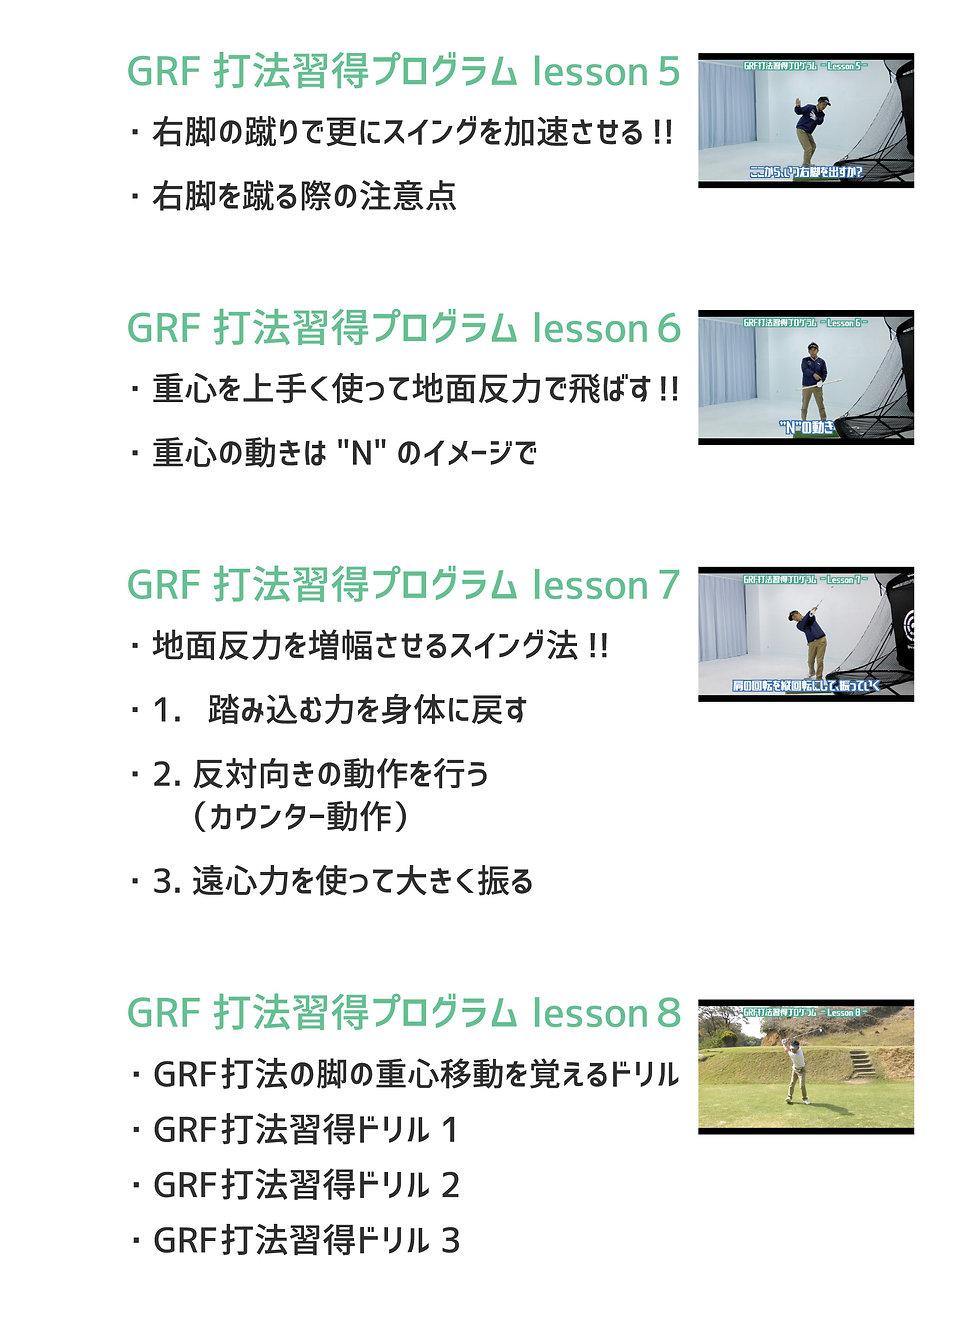 GRF-LP16.jpg